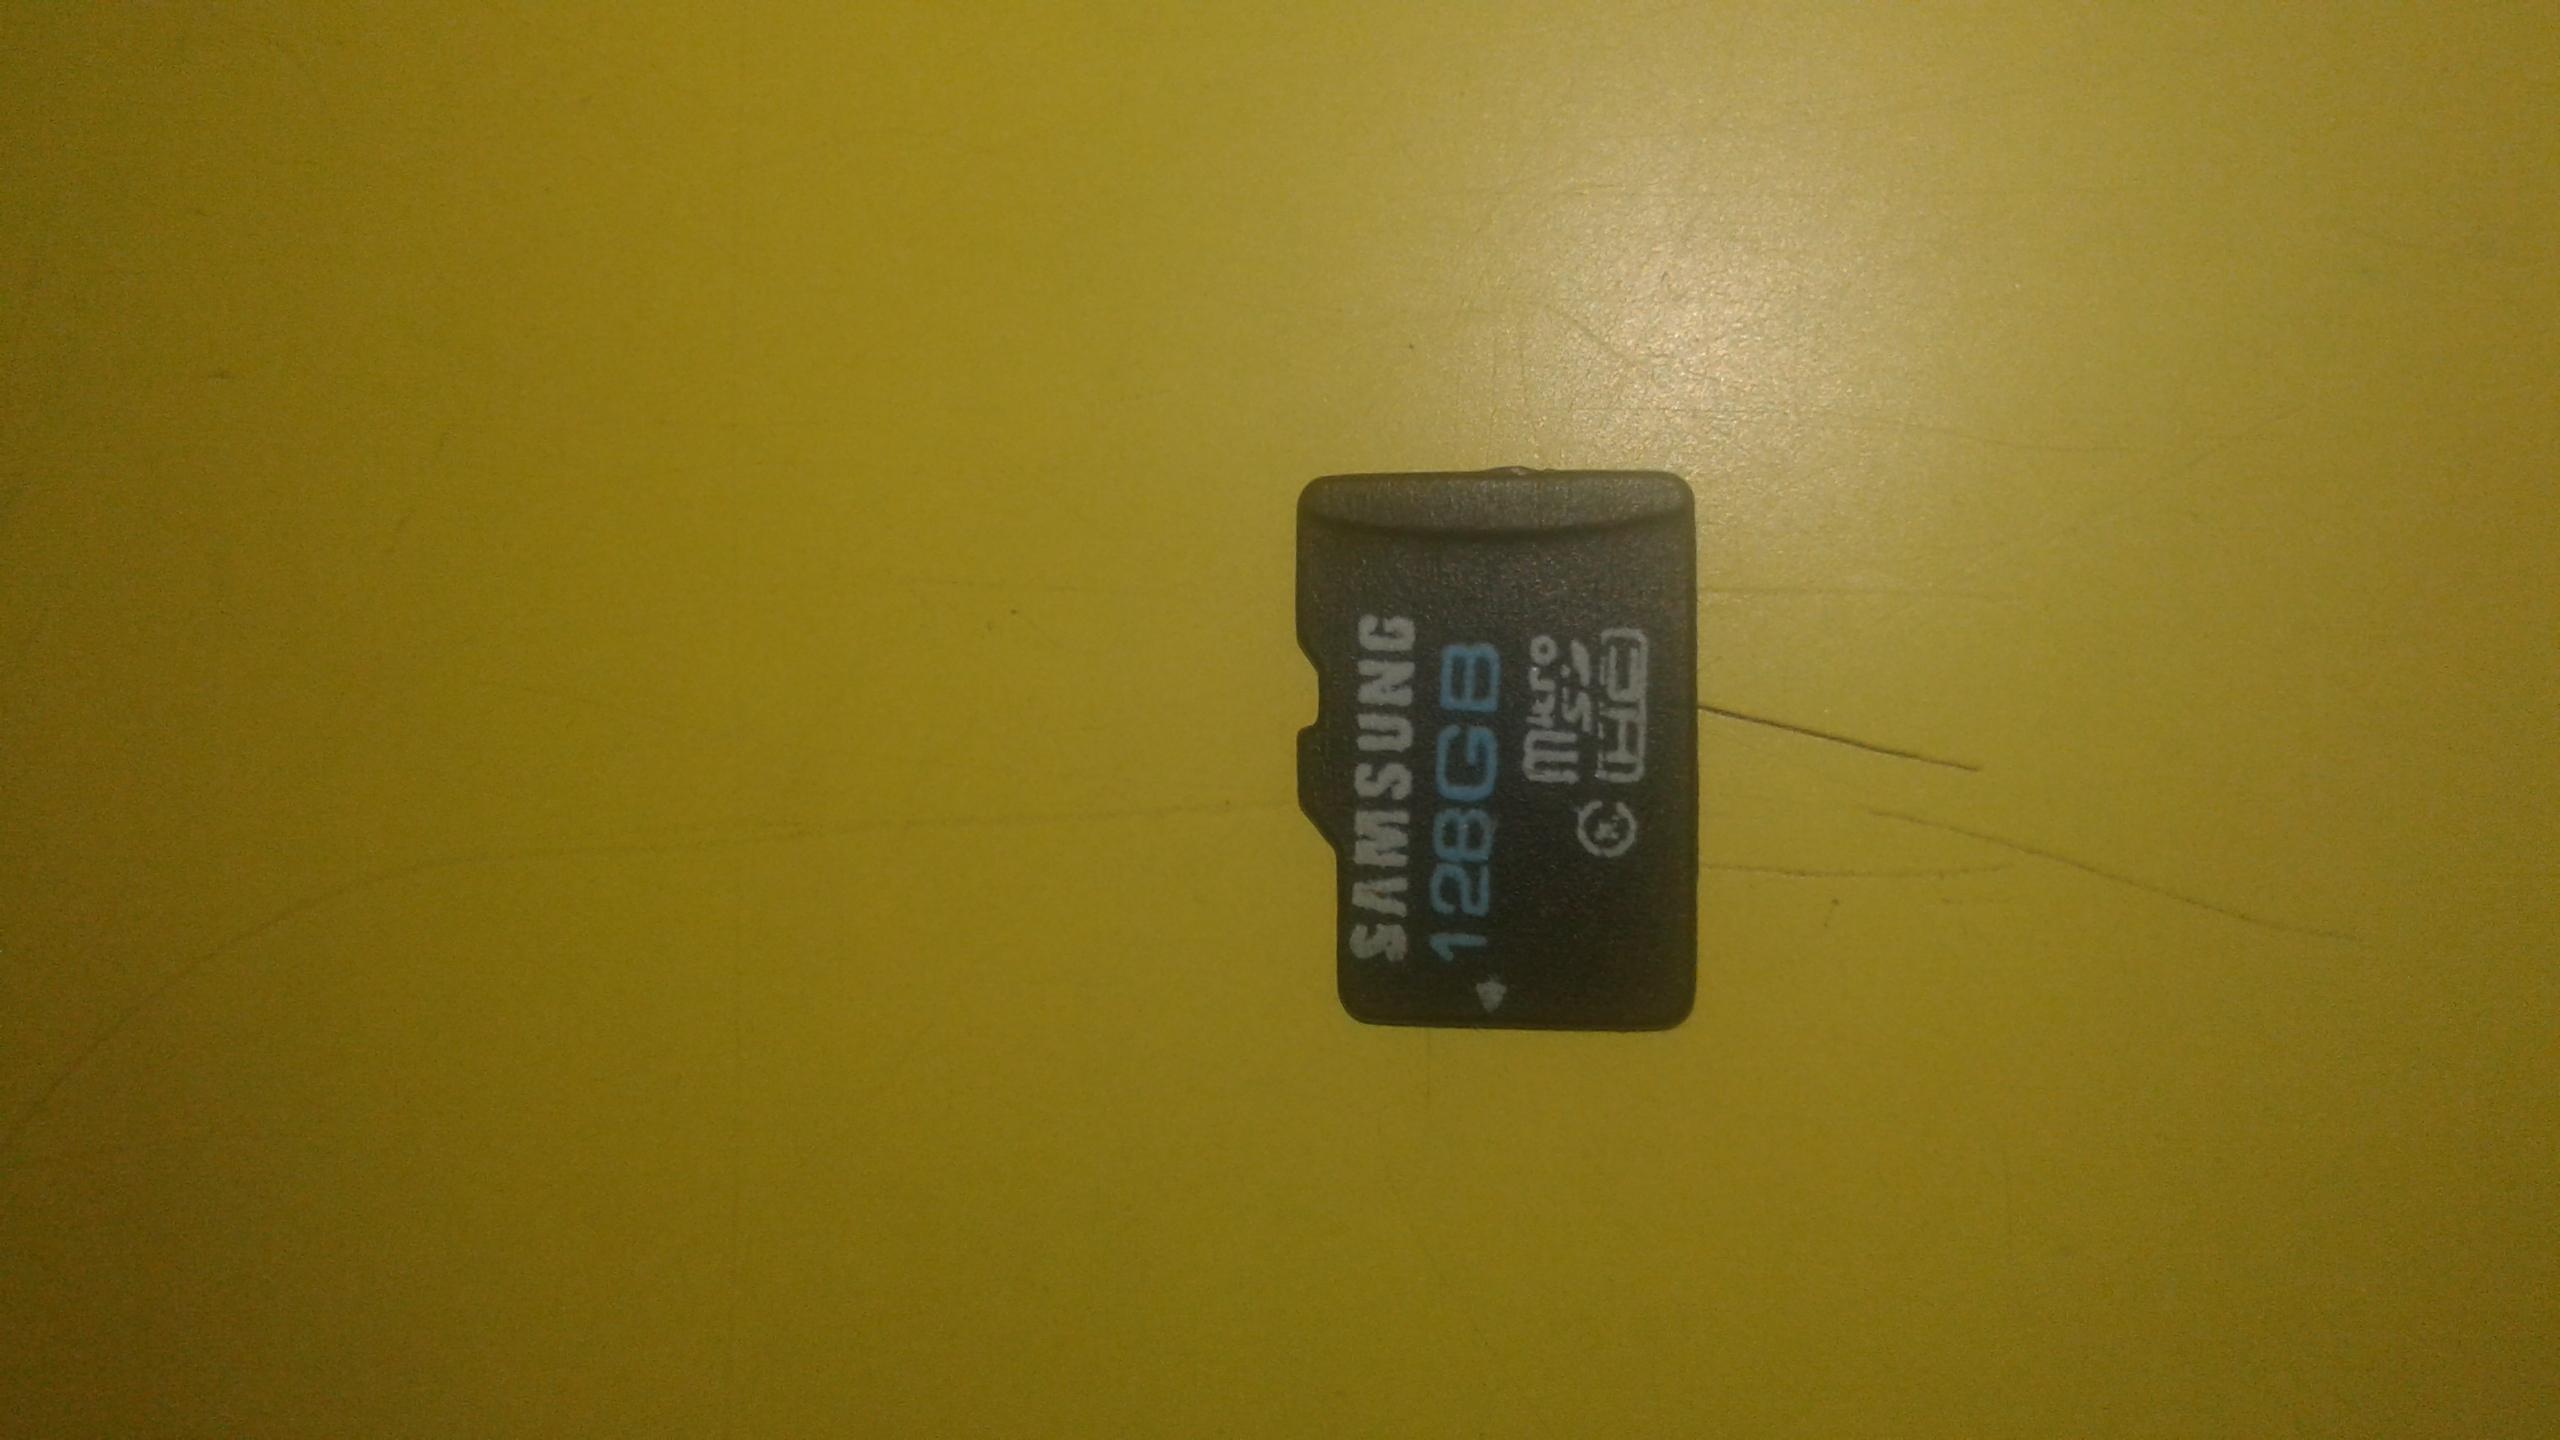 128GB SAMSUNG MEMORY CARD and 25000 mah powerbank